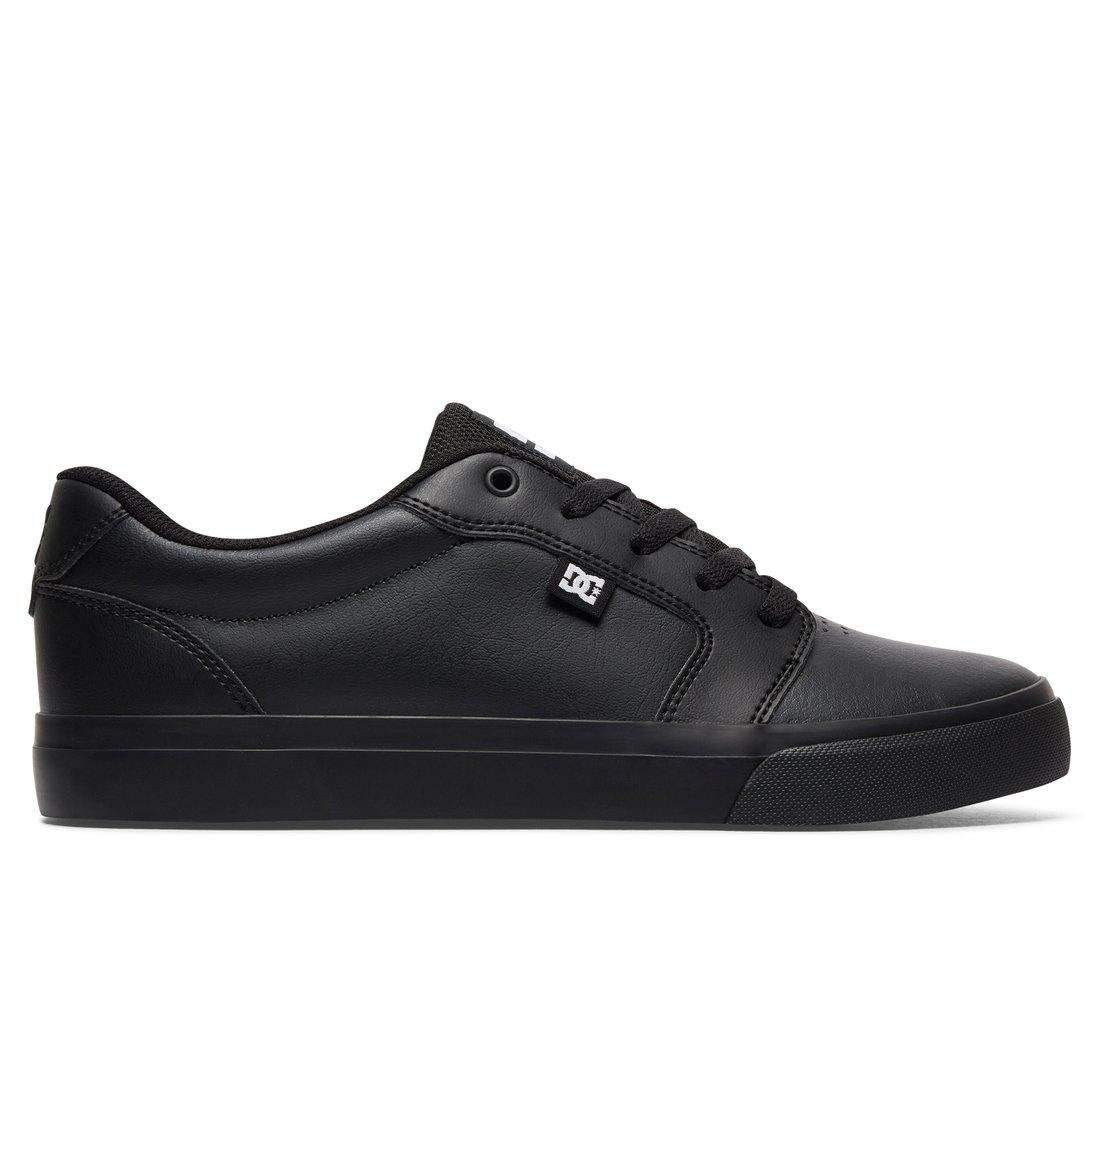 Dc Skateboard Shoes Anvil Se Black/black/black Size 11